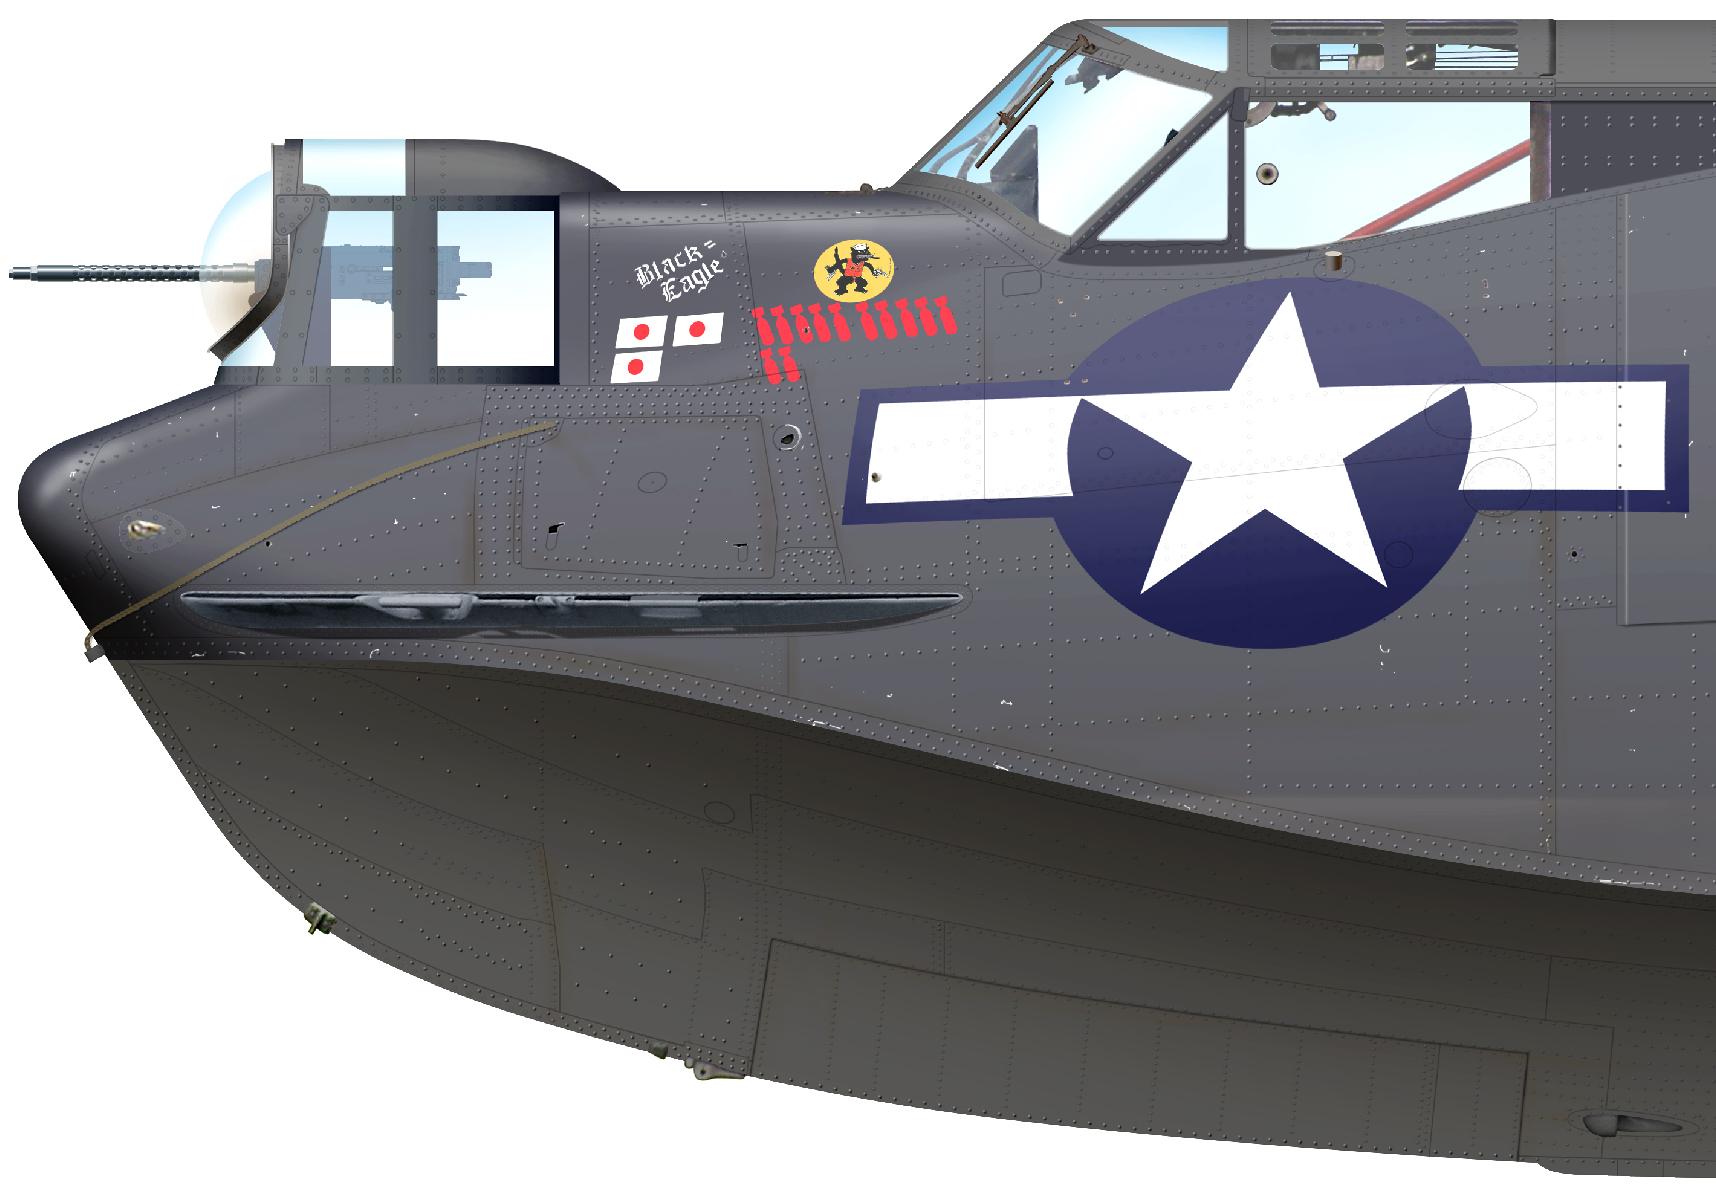 f4182d5b8ef PBY-5A Catalina 'Black Cat' Bu.No 46517 E-68 'Black Eagle' flown by  Capt.L.E.Rearden, Sr. of VPB-71, Manus Island, 1944